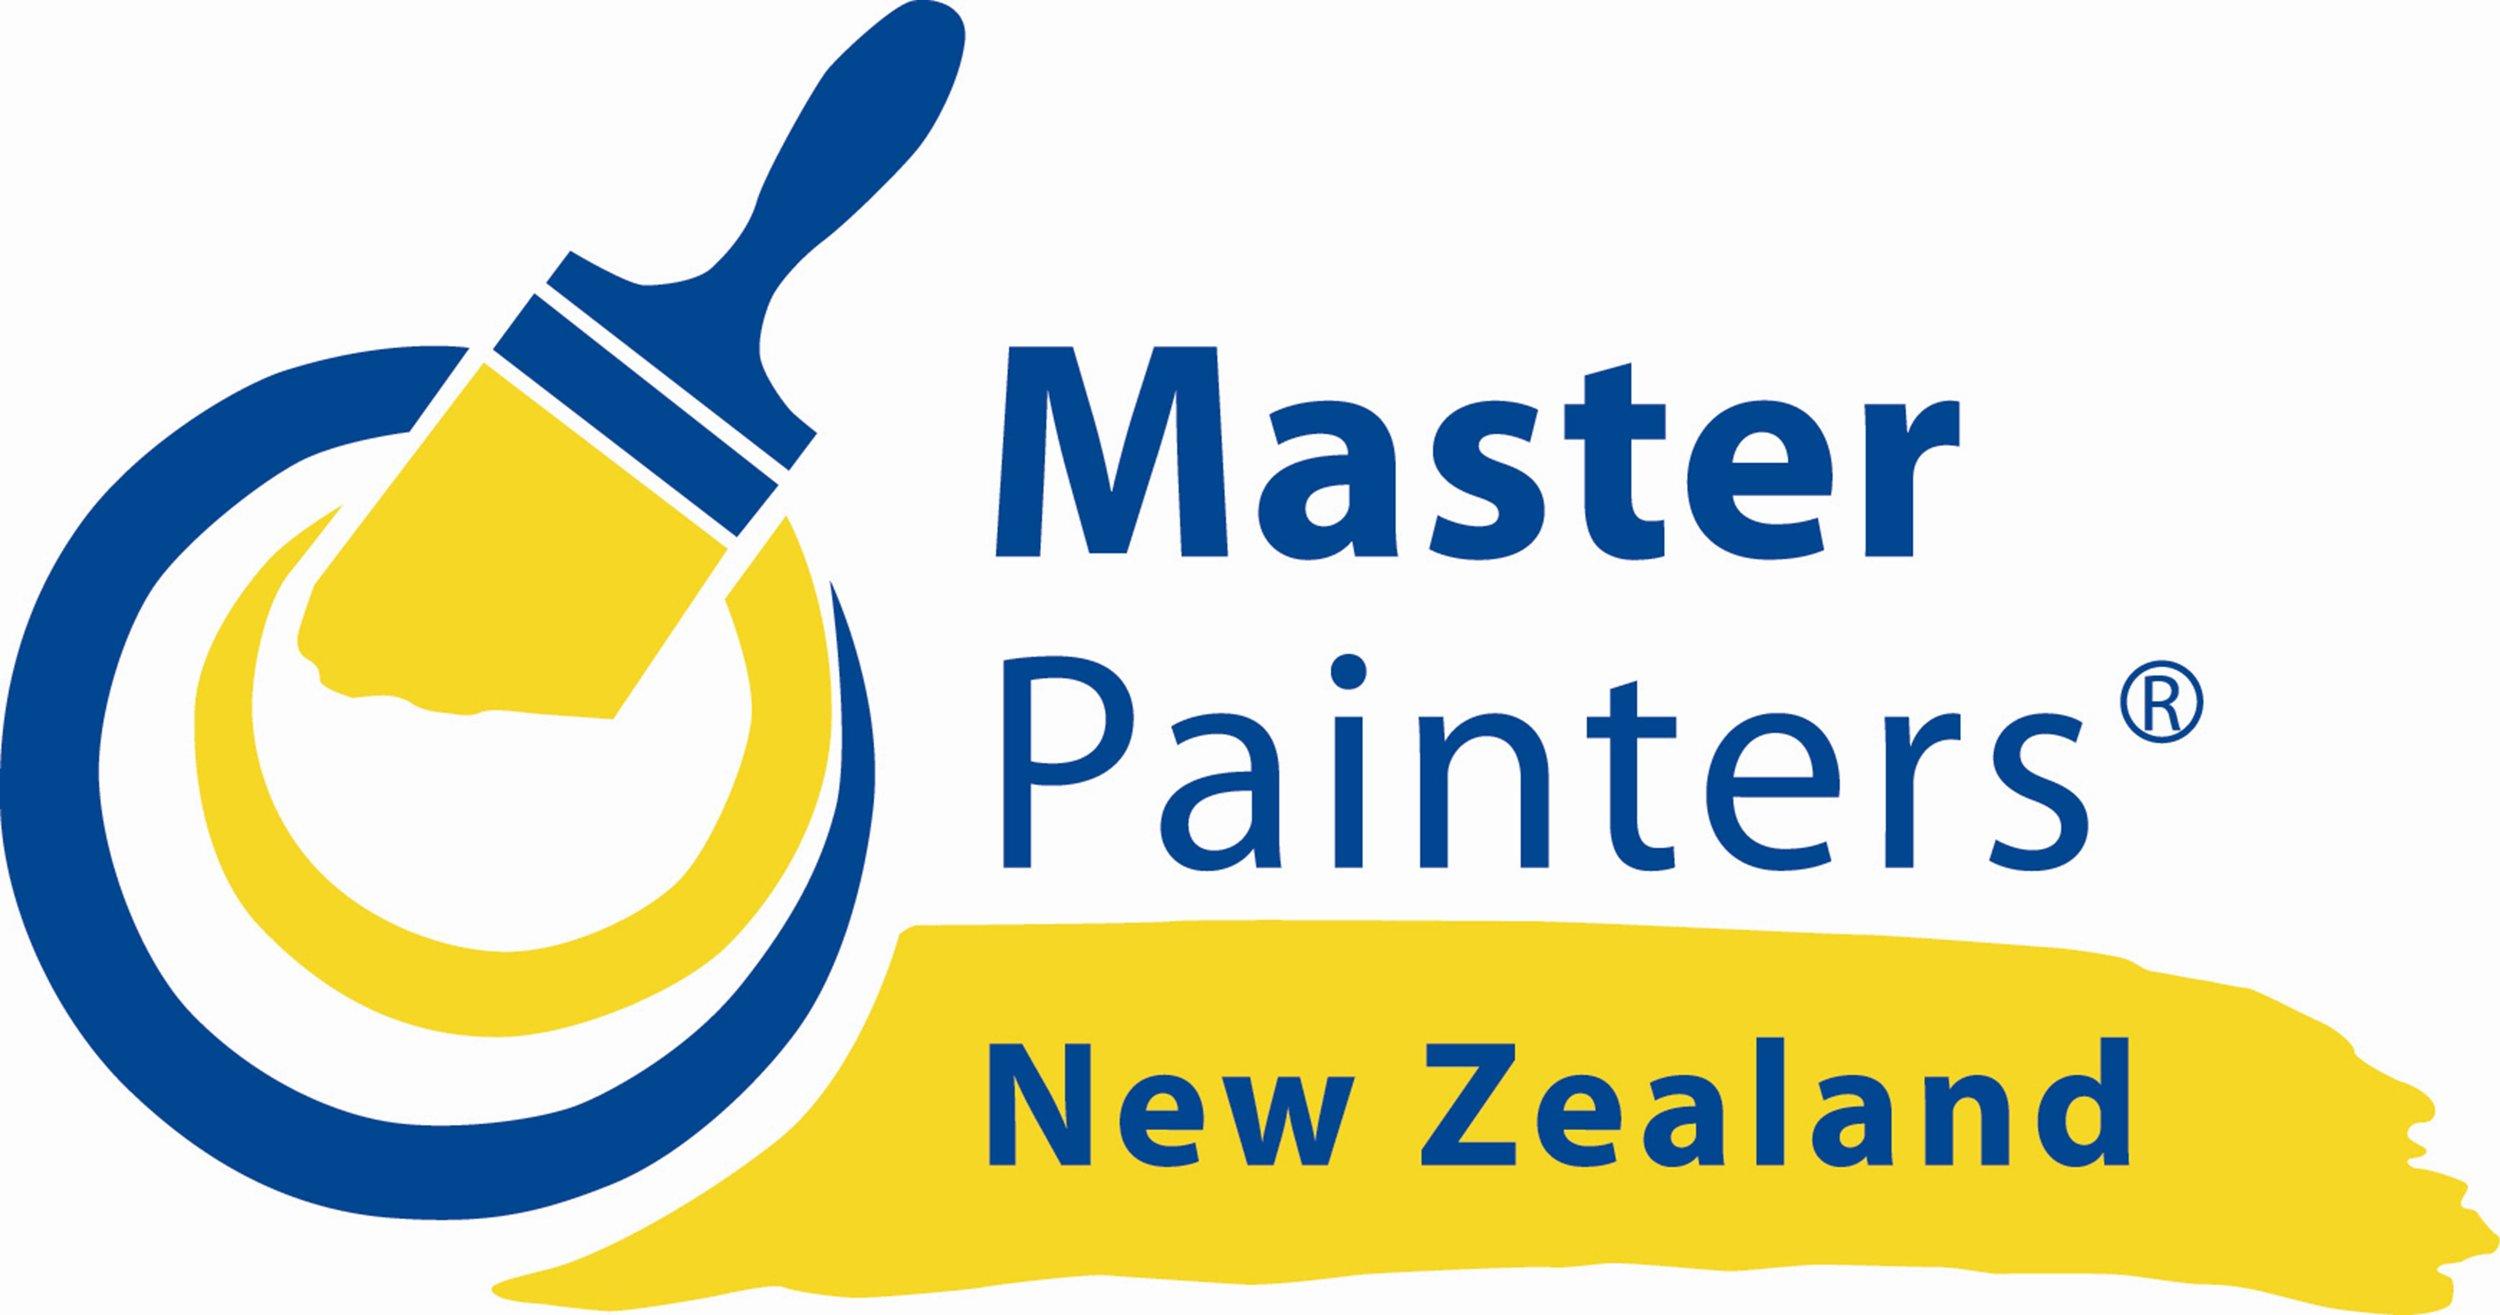 Master Painters logo highres.jpg